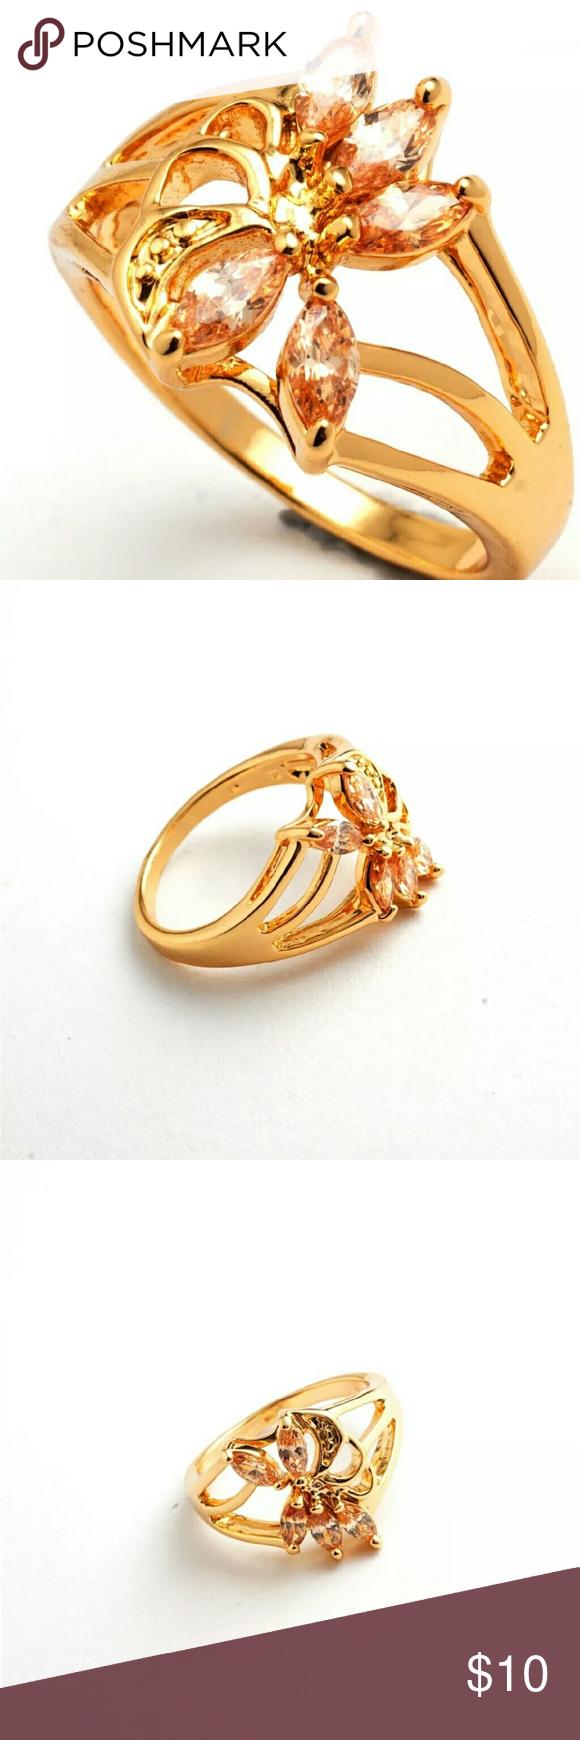 18K Gold Filled Orange C.Z Ring 18K Gold Filled Orange C.Z Ring  Size 7 Jewelry Rings